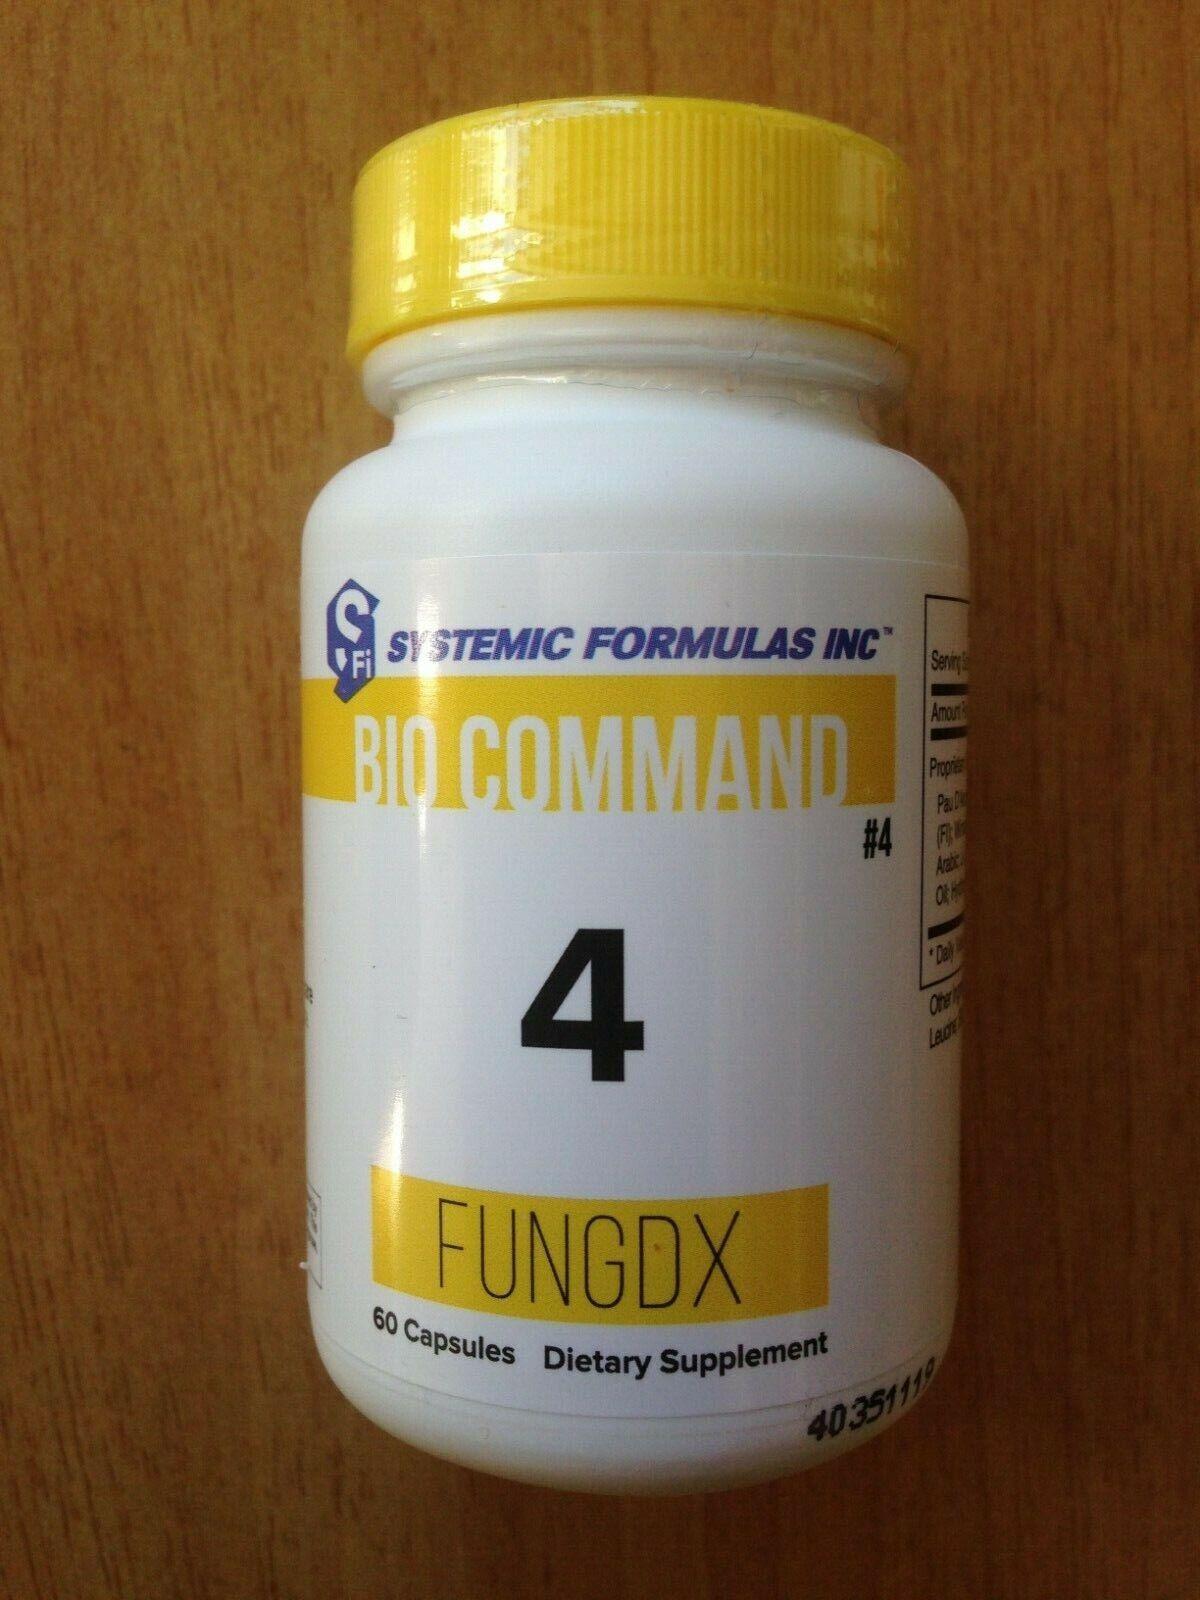 Systemic Formulas Bio Command 4 – FungDX 60 Capsules